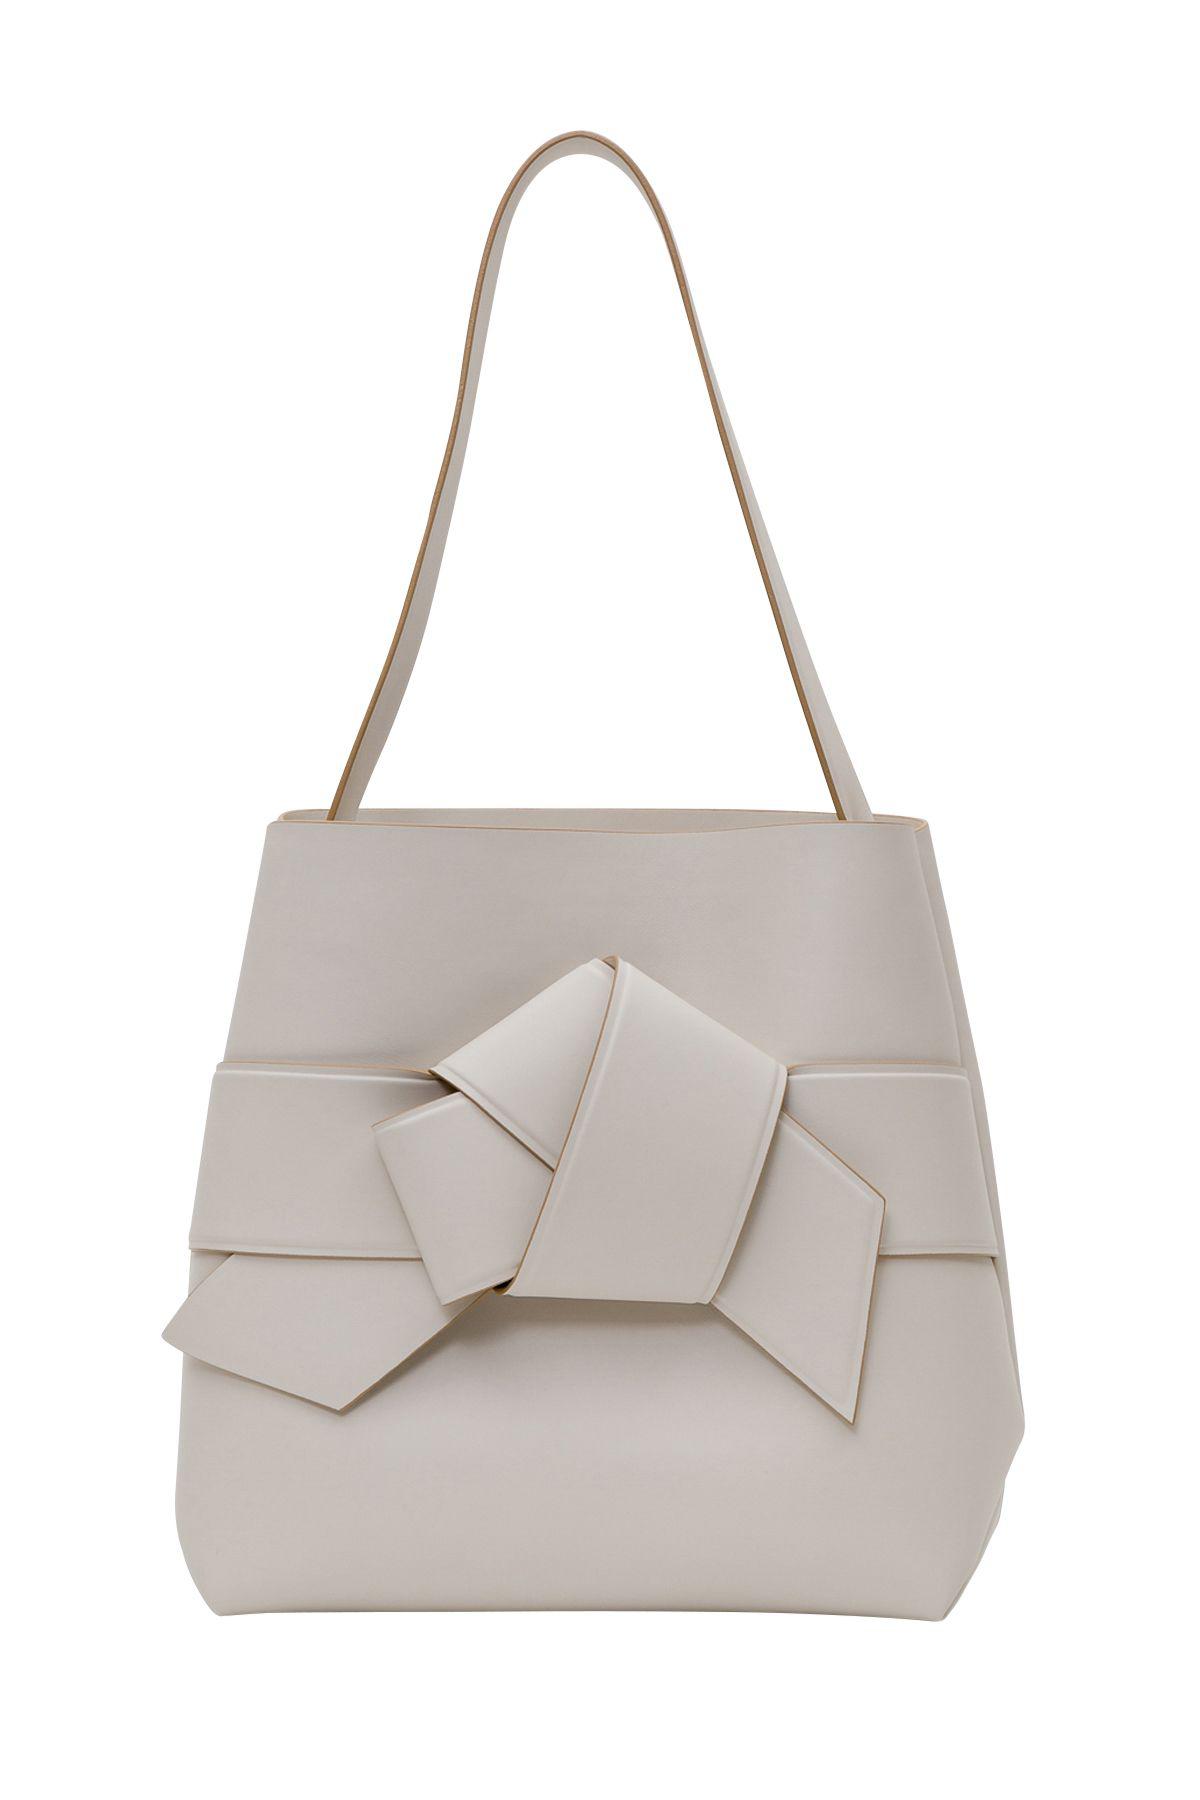 1db1dddbf2 Acne Studios Musubi Shopper In Bianco